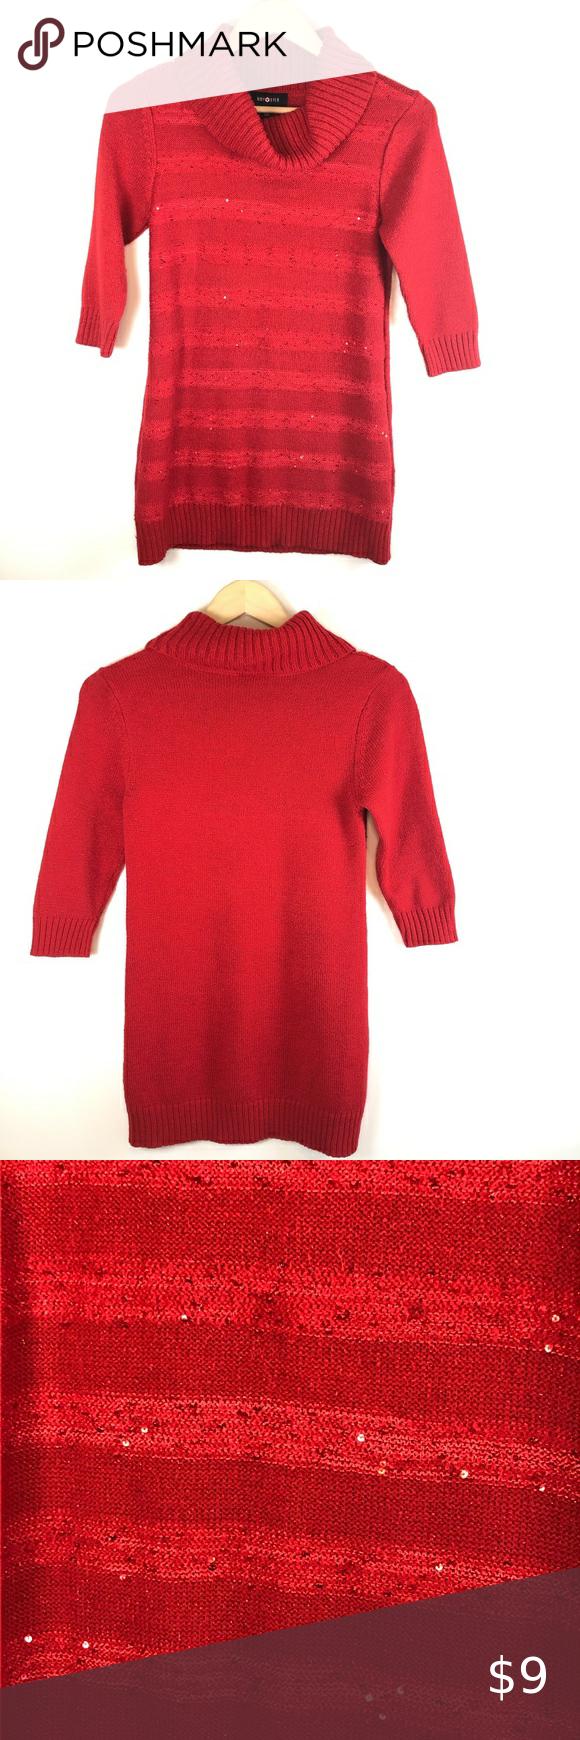 Amy Byer Girls Sweater Dress Red Size Xl W Sequins In 2020 Girls Sweater Dress Girls Sweaters Clothes Design [ 1740 x 580 Pixel ]